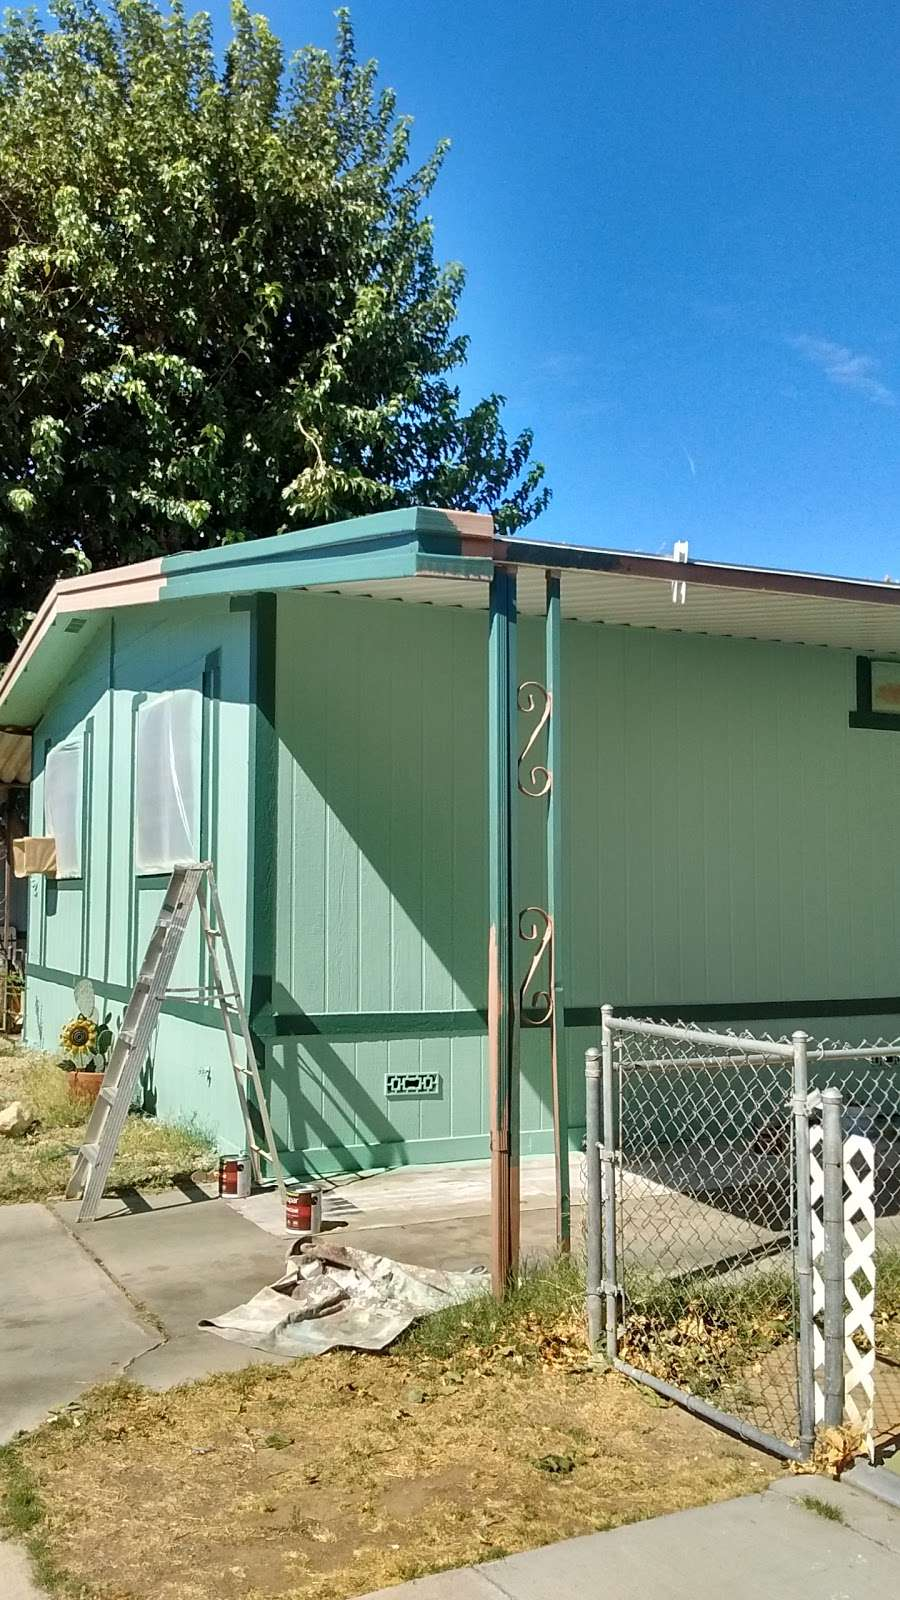 Hacienda Mobile Estates - rv park  | Photo 5 of 10 | Address: 2330 E Ave J 8, Lancaster, CA 93535, USA | Phone: (661) 945-1597